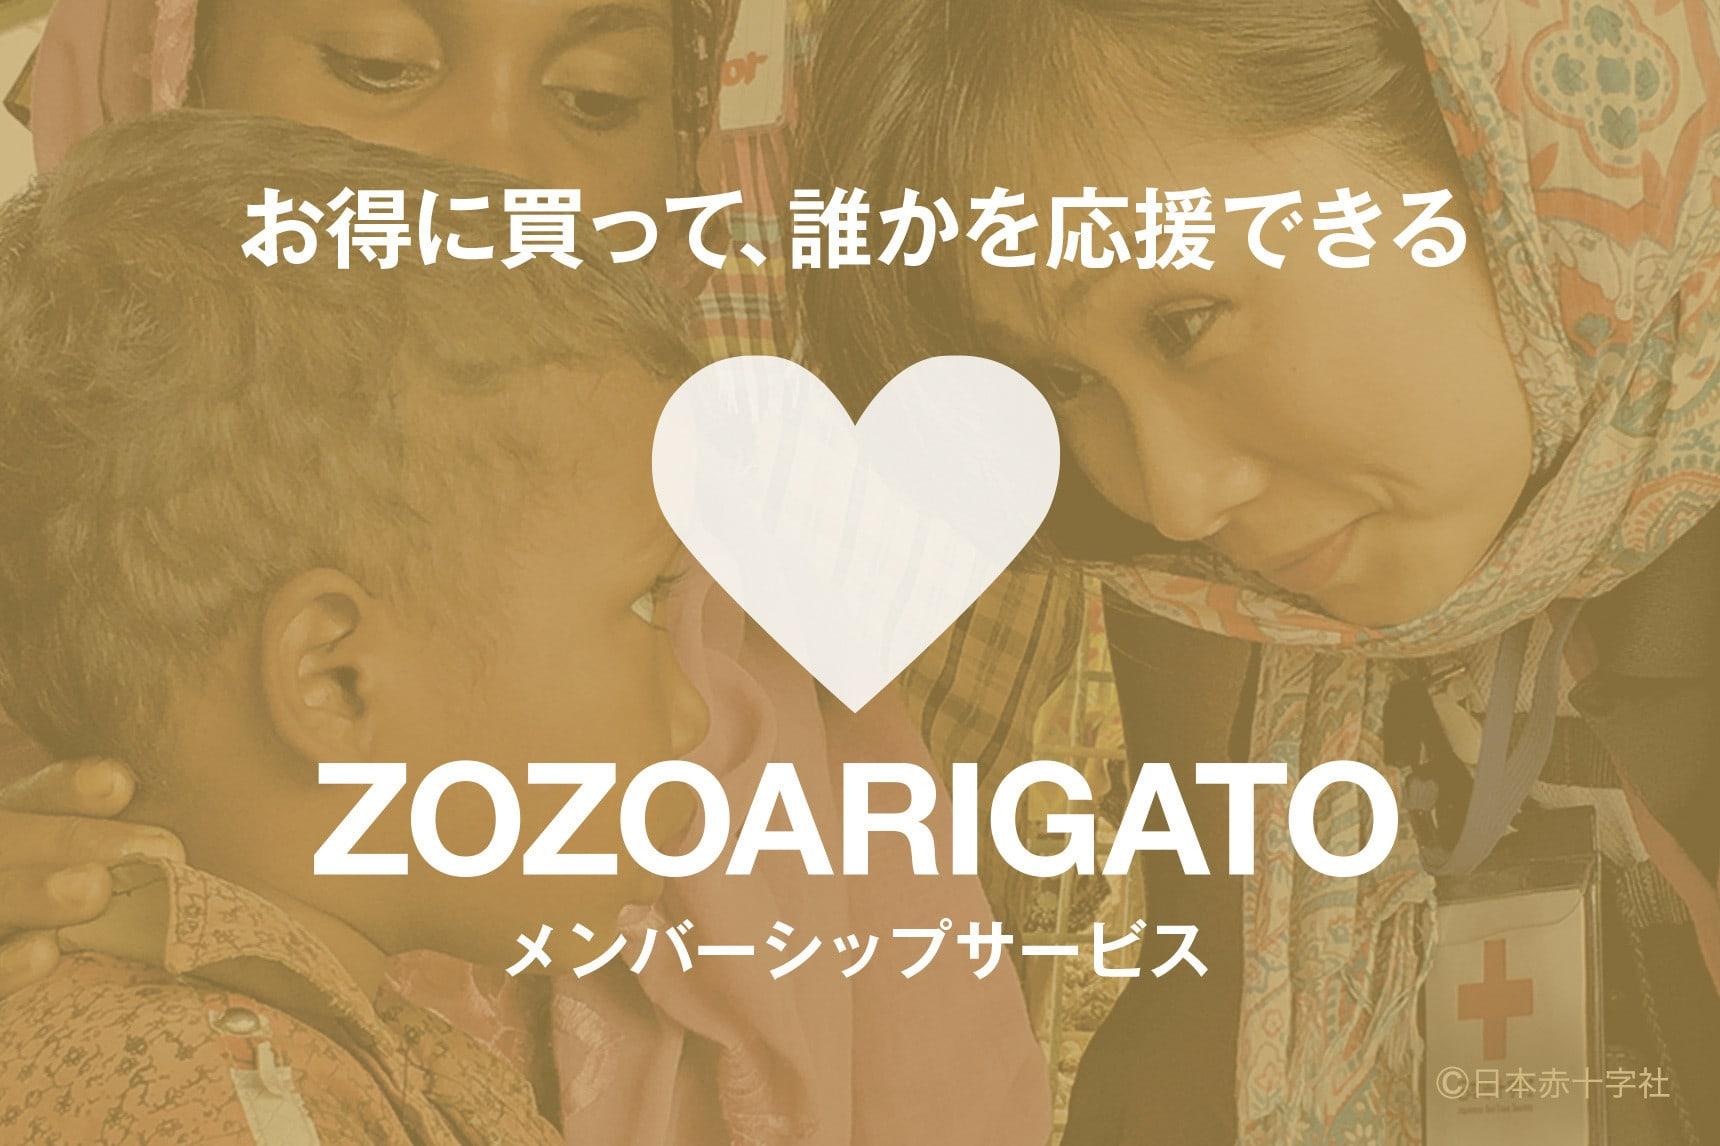 ffa6b4dc42b 「ゾゾタウン(ZOZOTOWN)」が12月25日、社会貢献型の新たな有料サービス「ゾゾアリガトー(ZOZOARIGATO)メンバーシップ」を開始した。サービスを通じて、創業20周年  ...